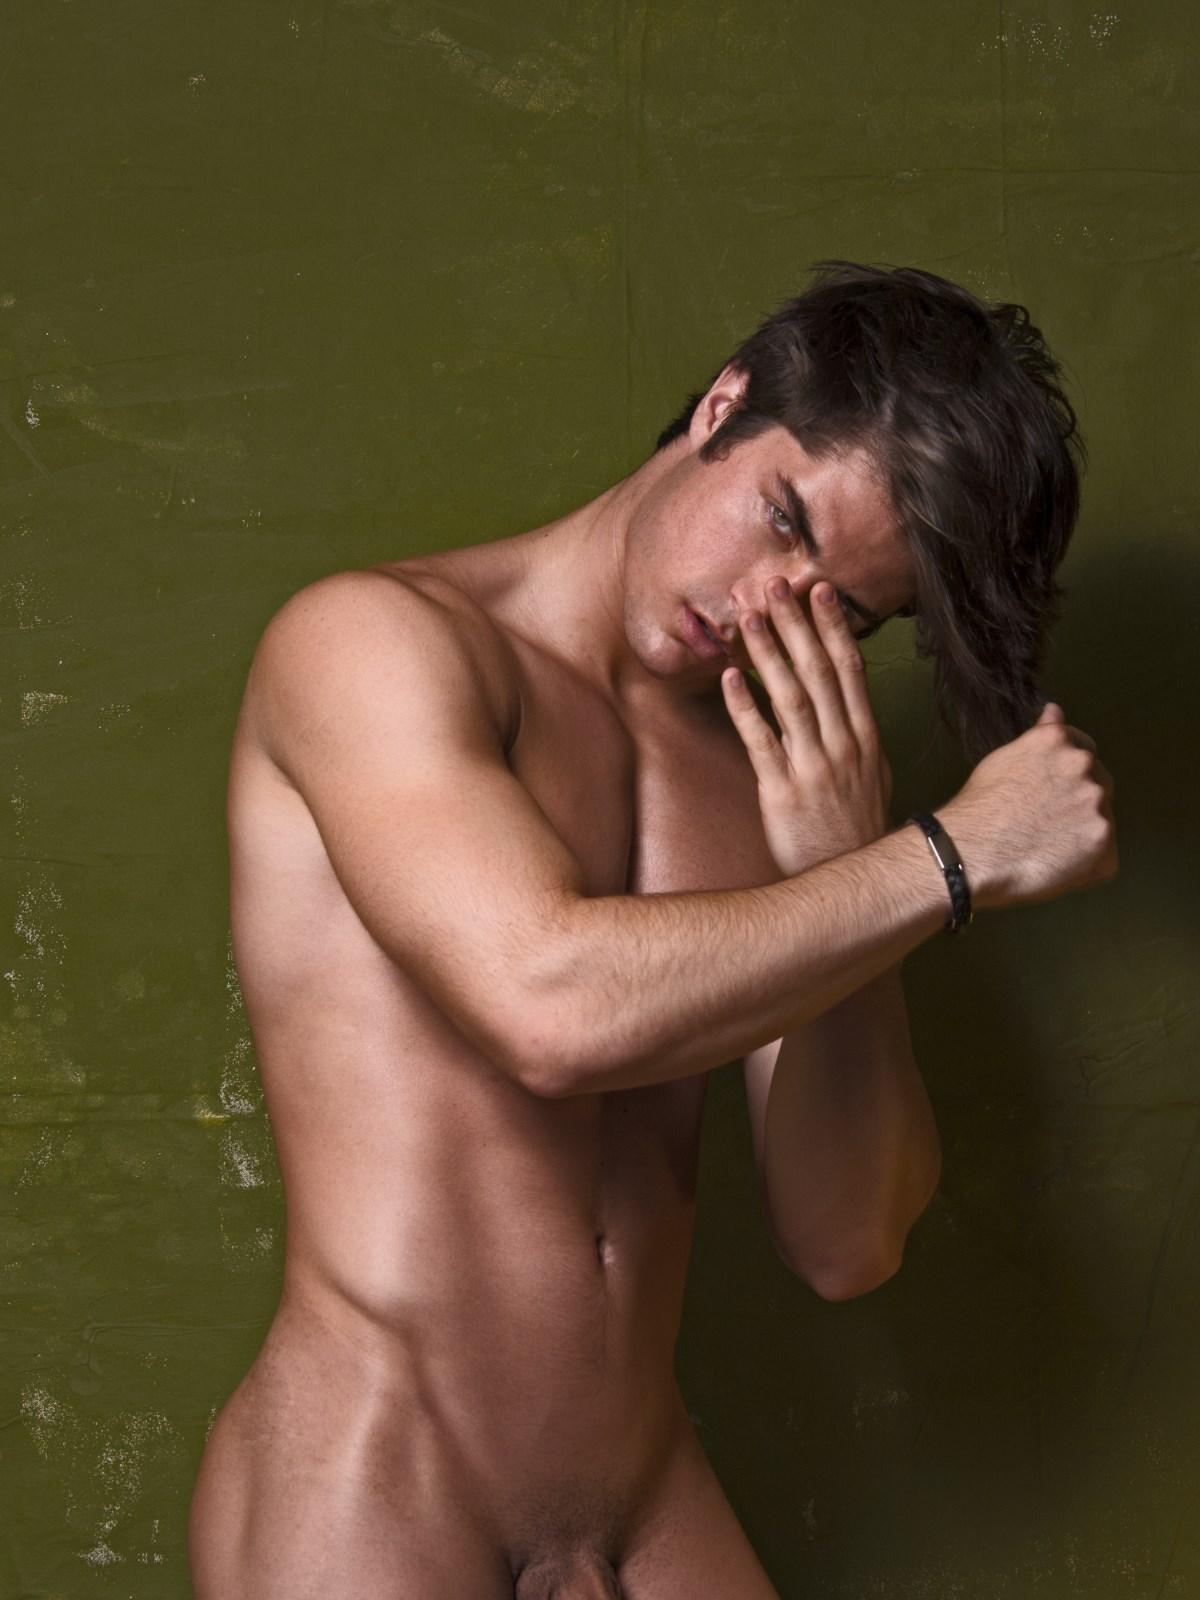 austin-sikora-nude